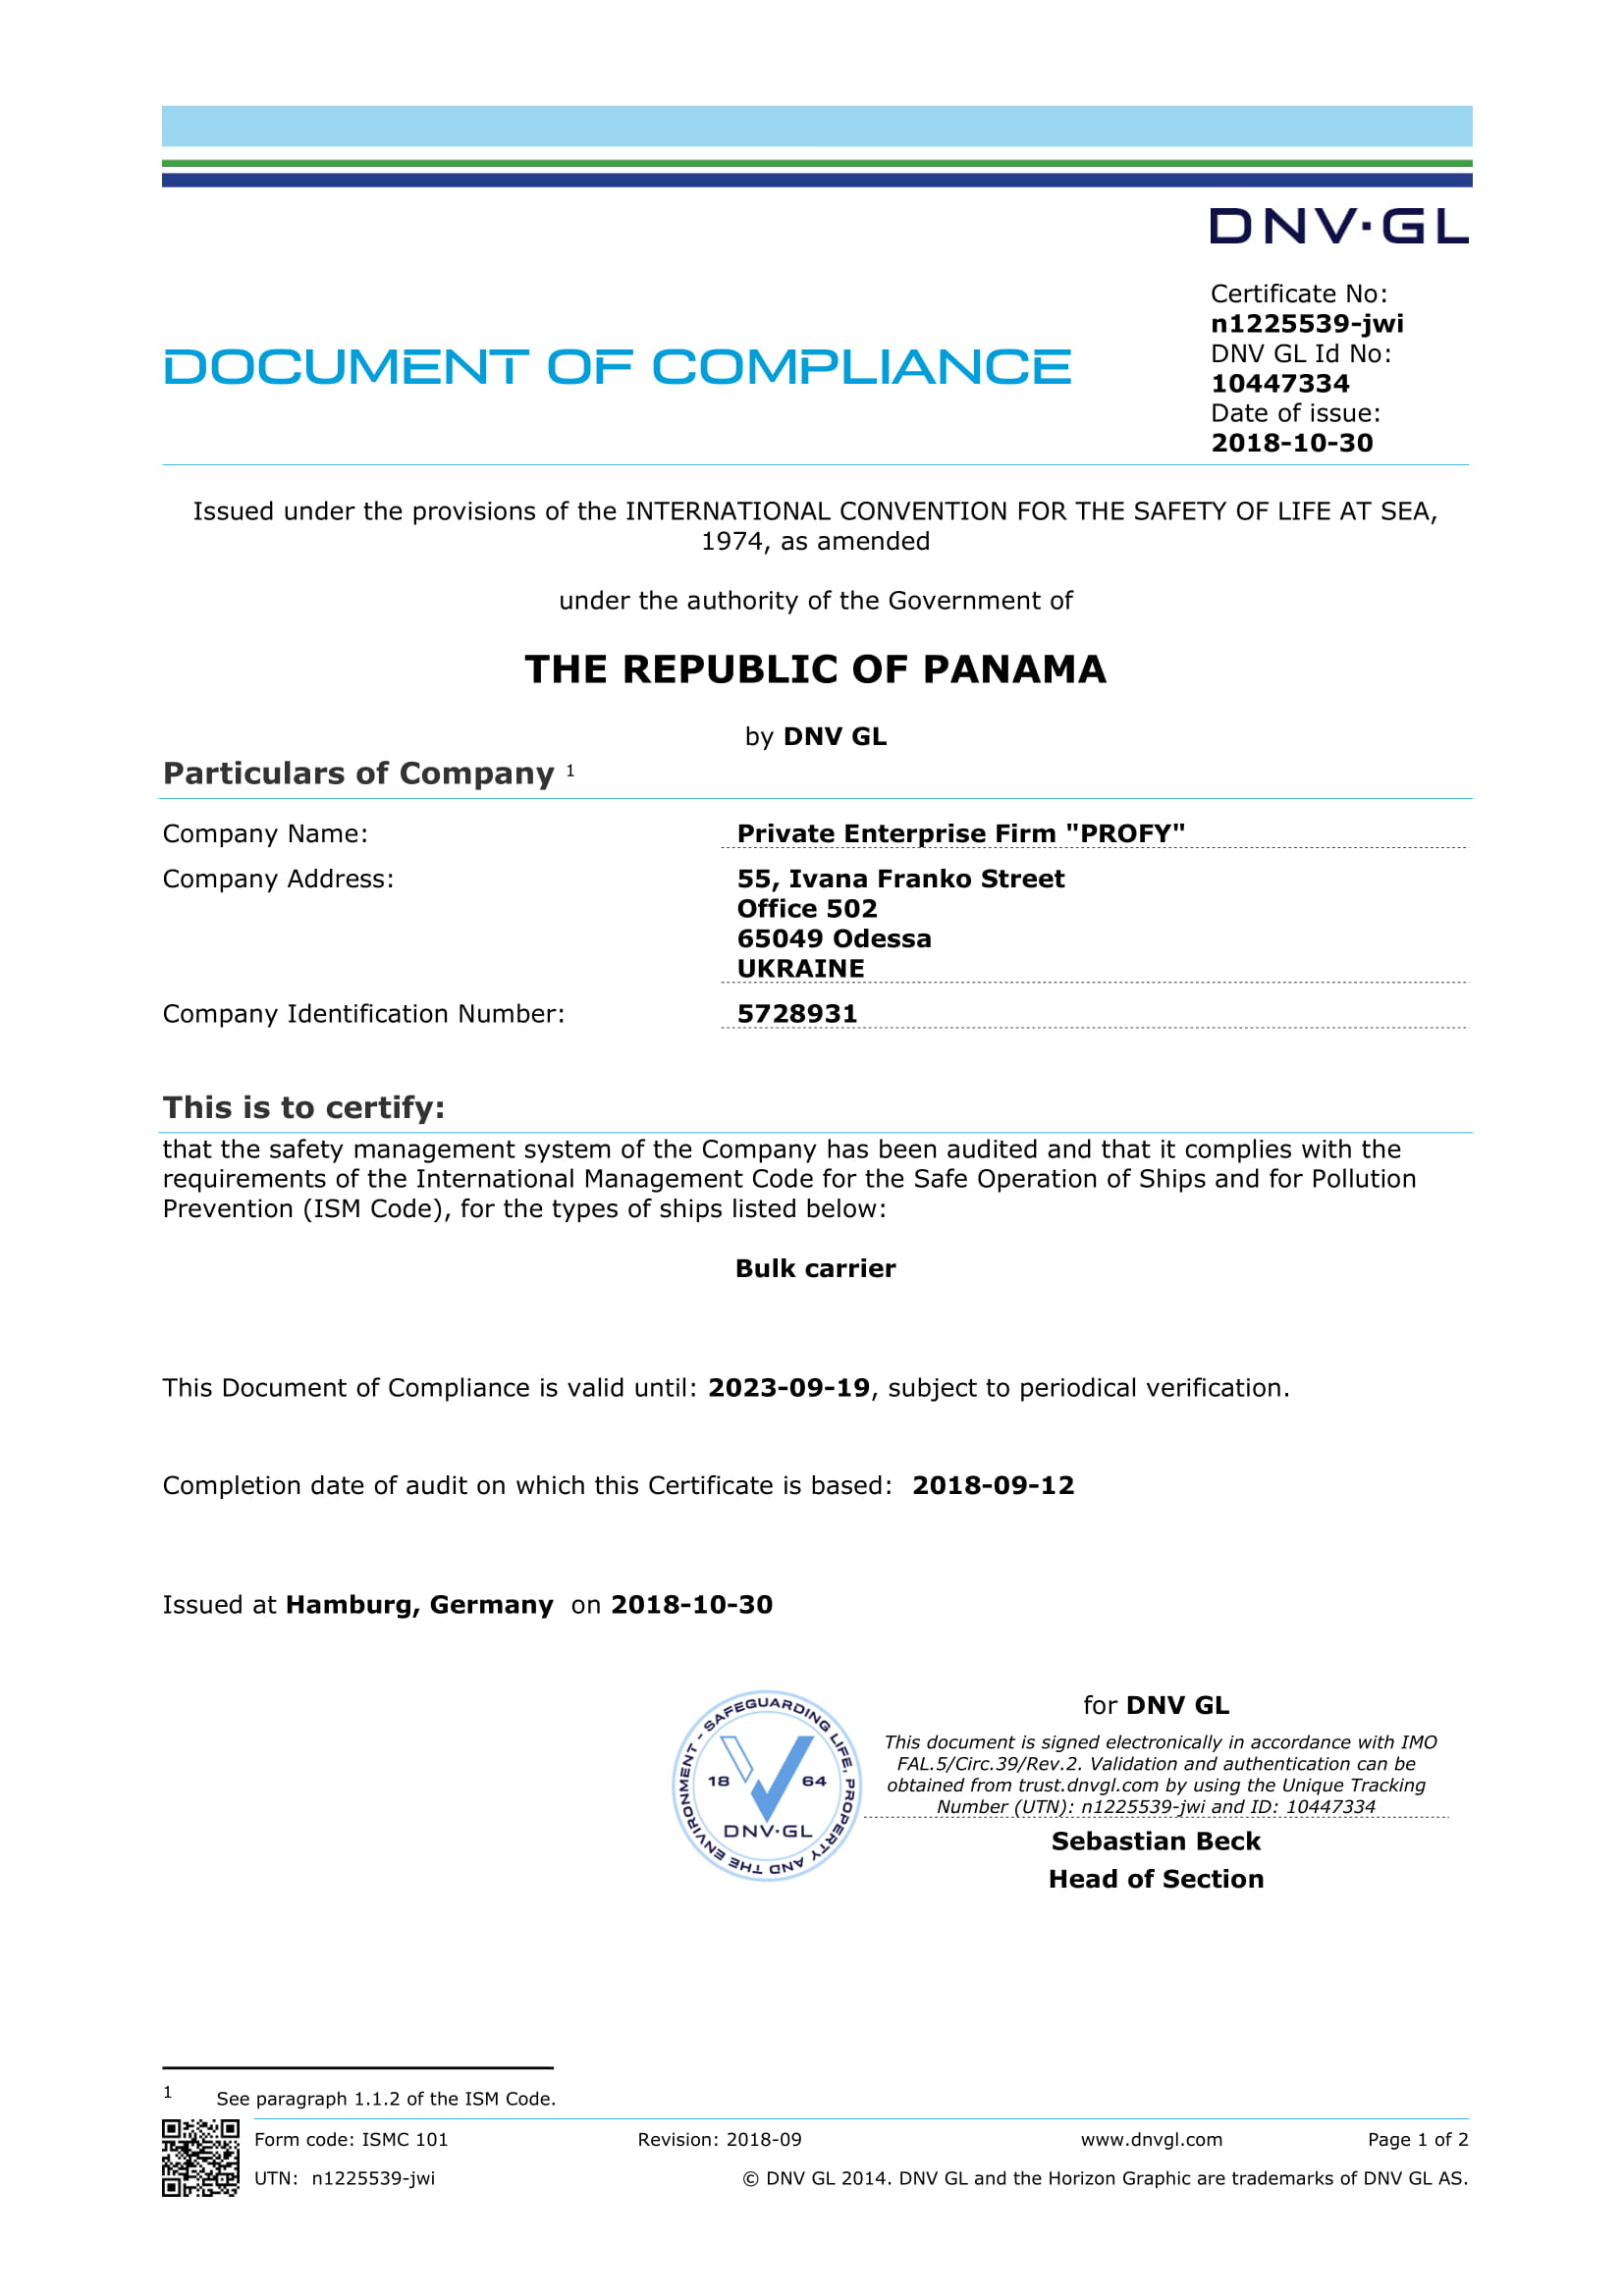 PANAMA DOC-1